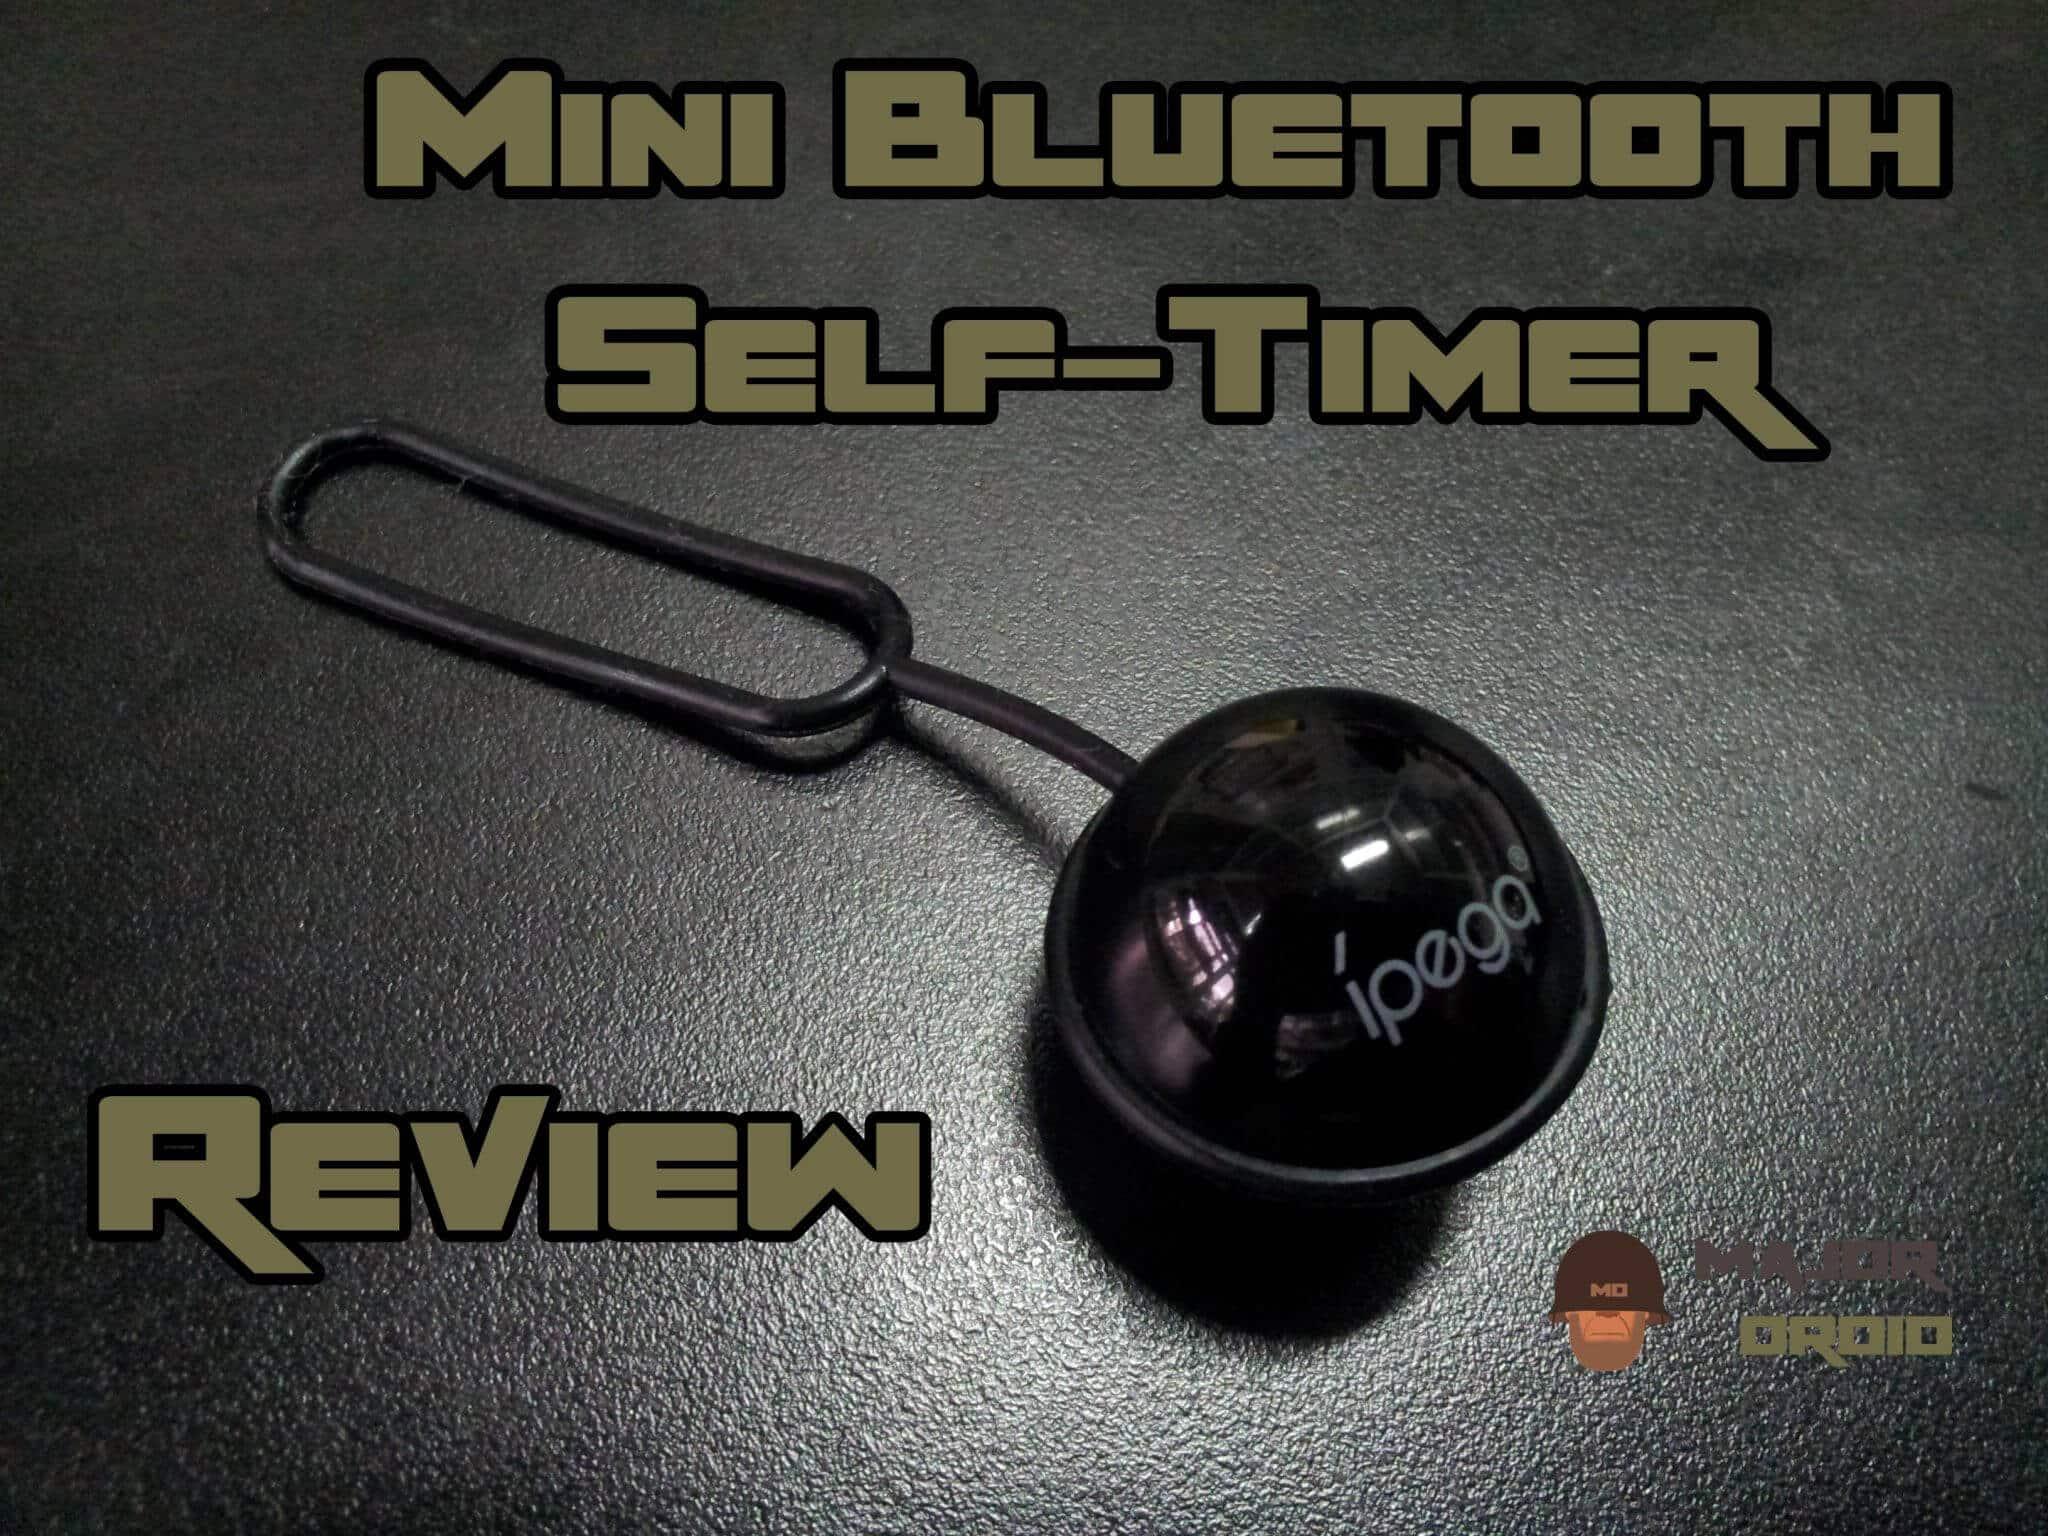 ipega PG-9027 Bluetooth remote control camera self-timer